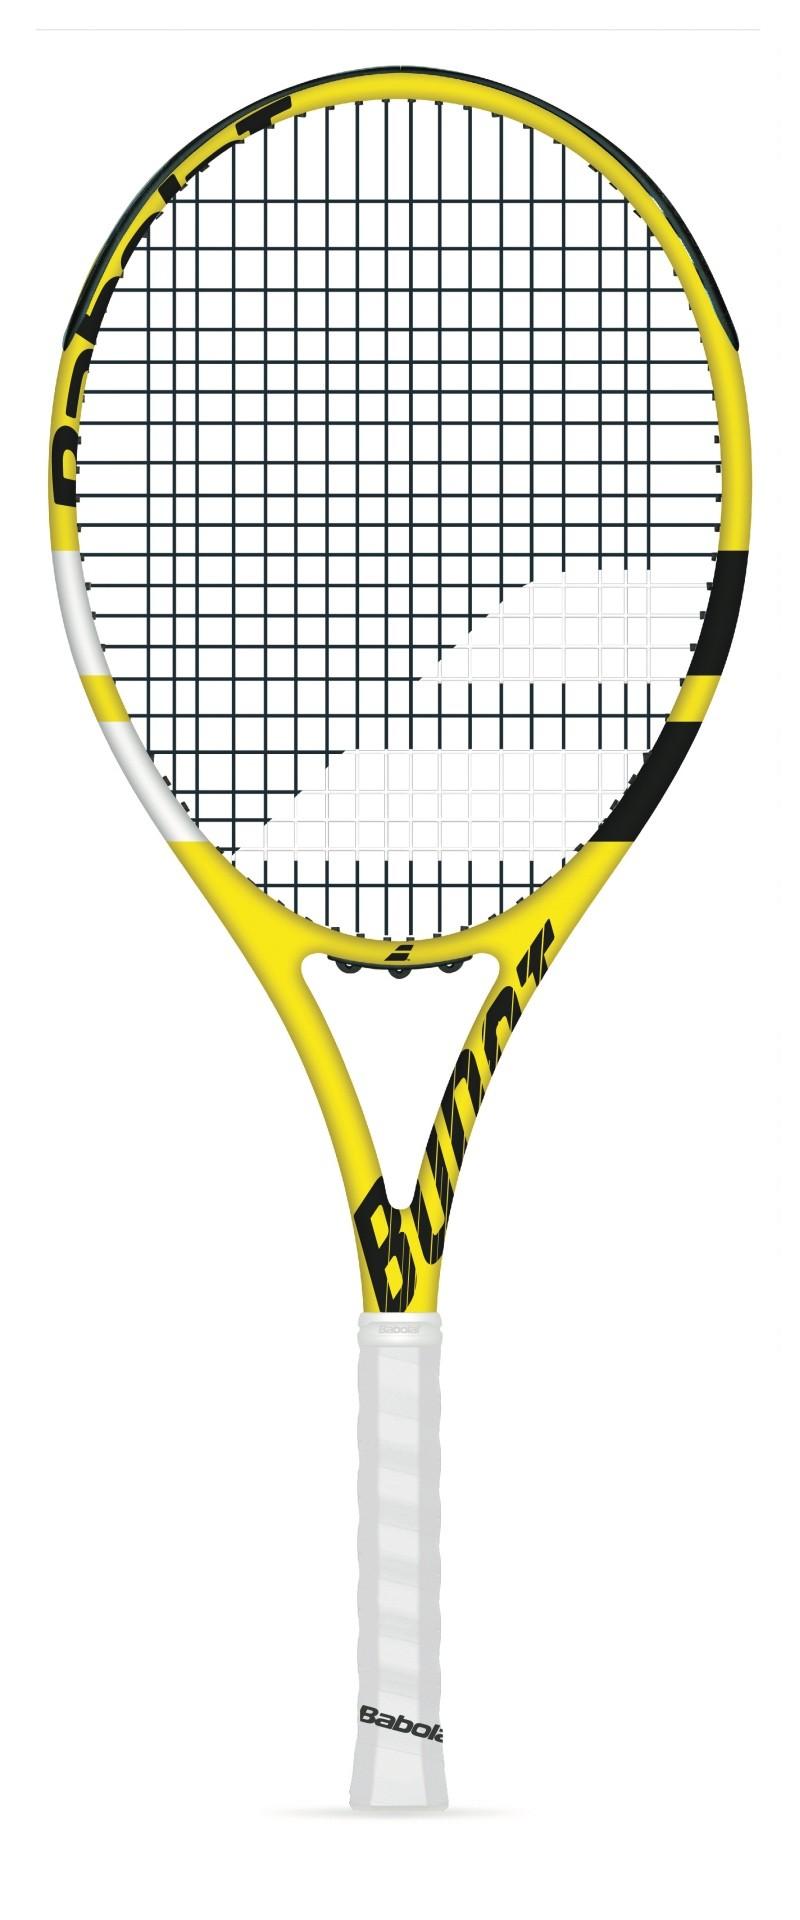 Rakieta tenisowa Babolat Boost Aero